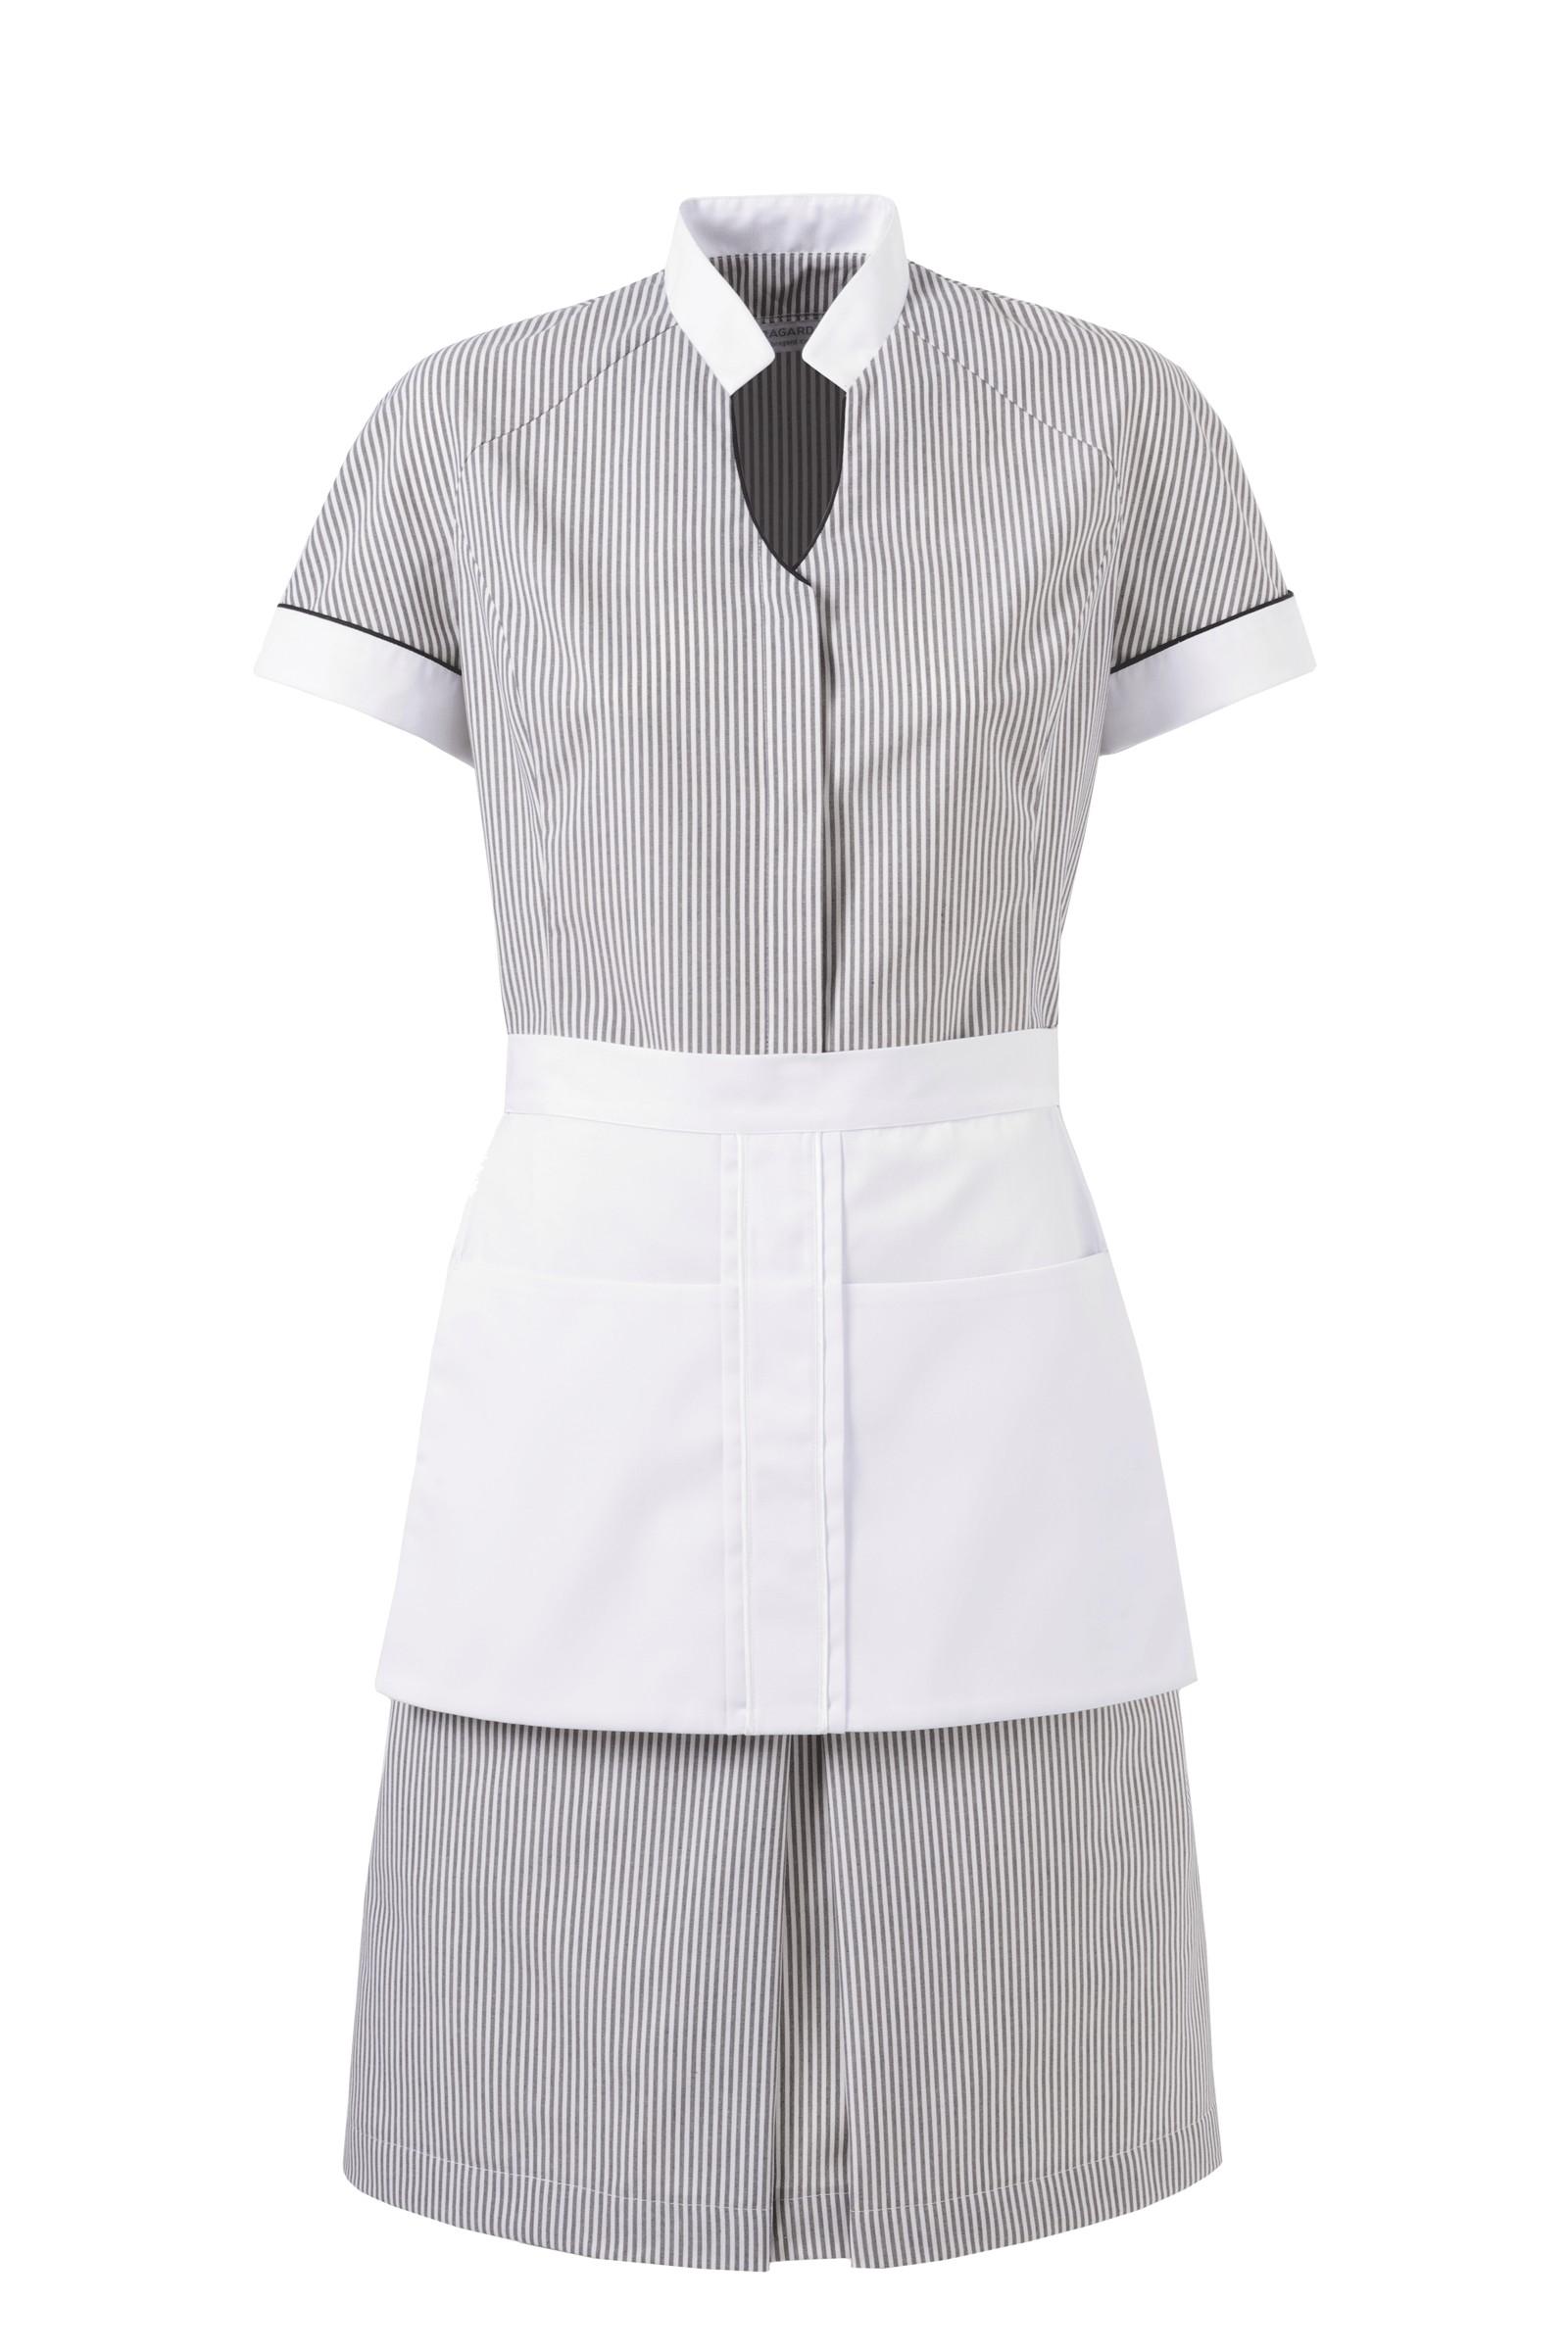 Ambra robe femme de chambre gris blanc - Robe de chambre noir femme ...